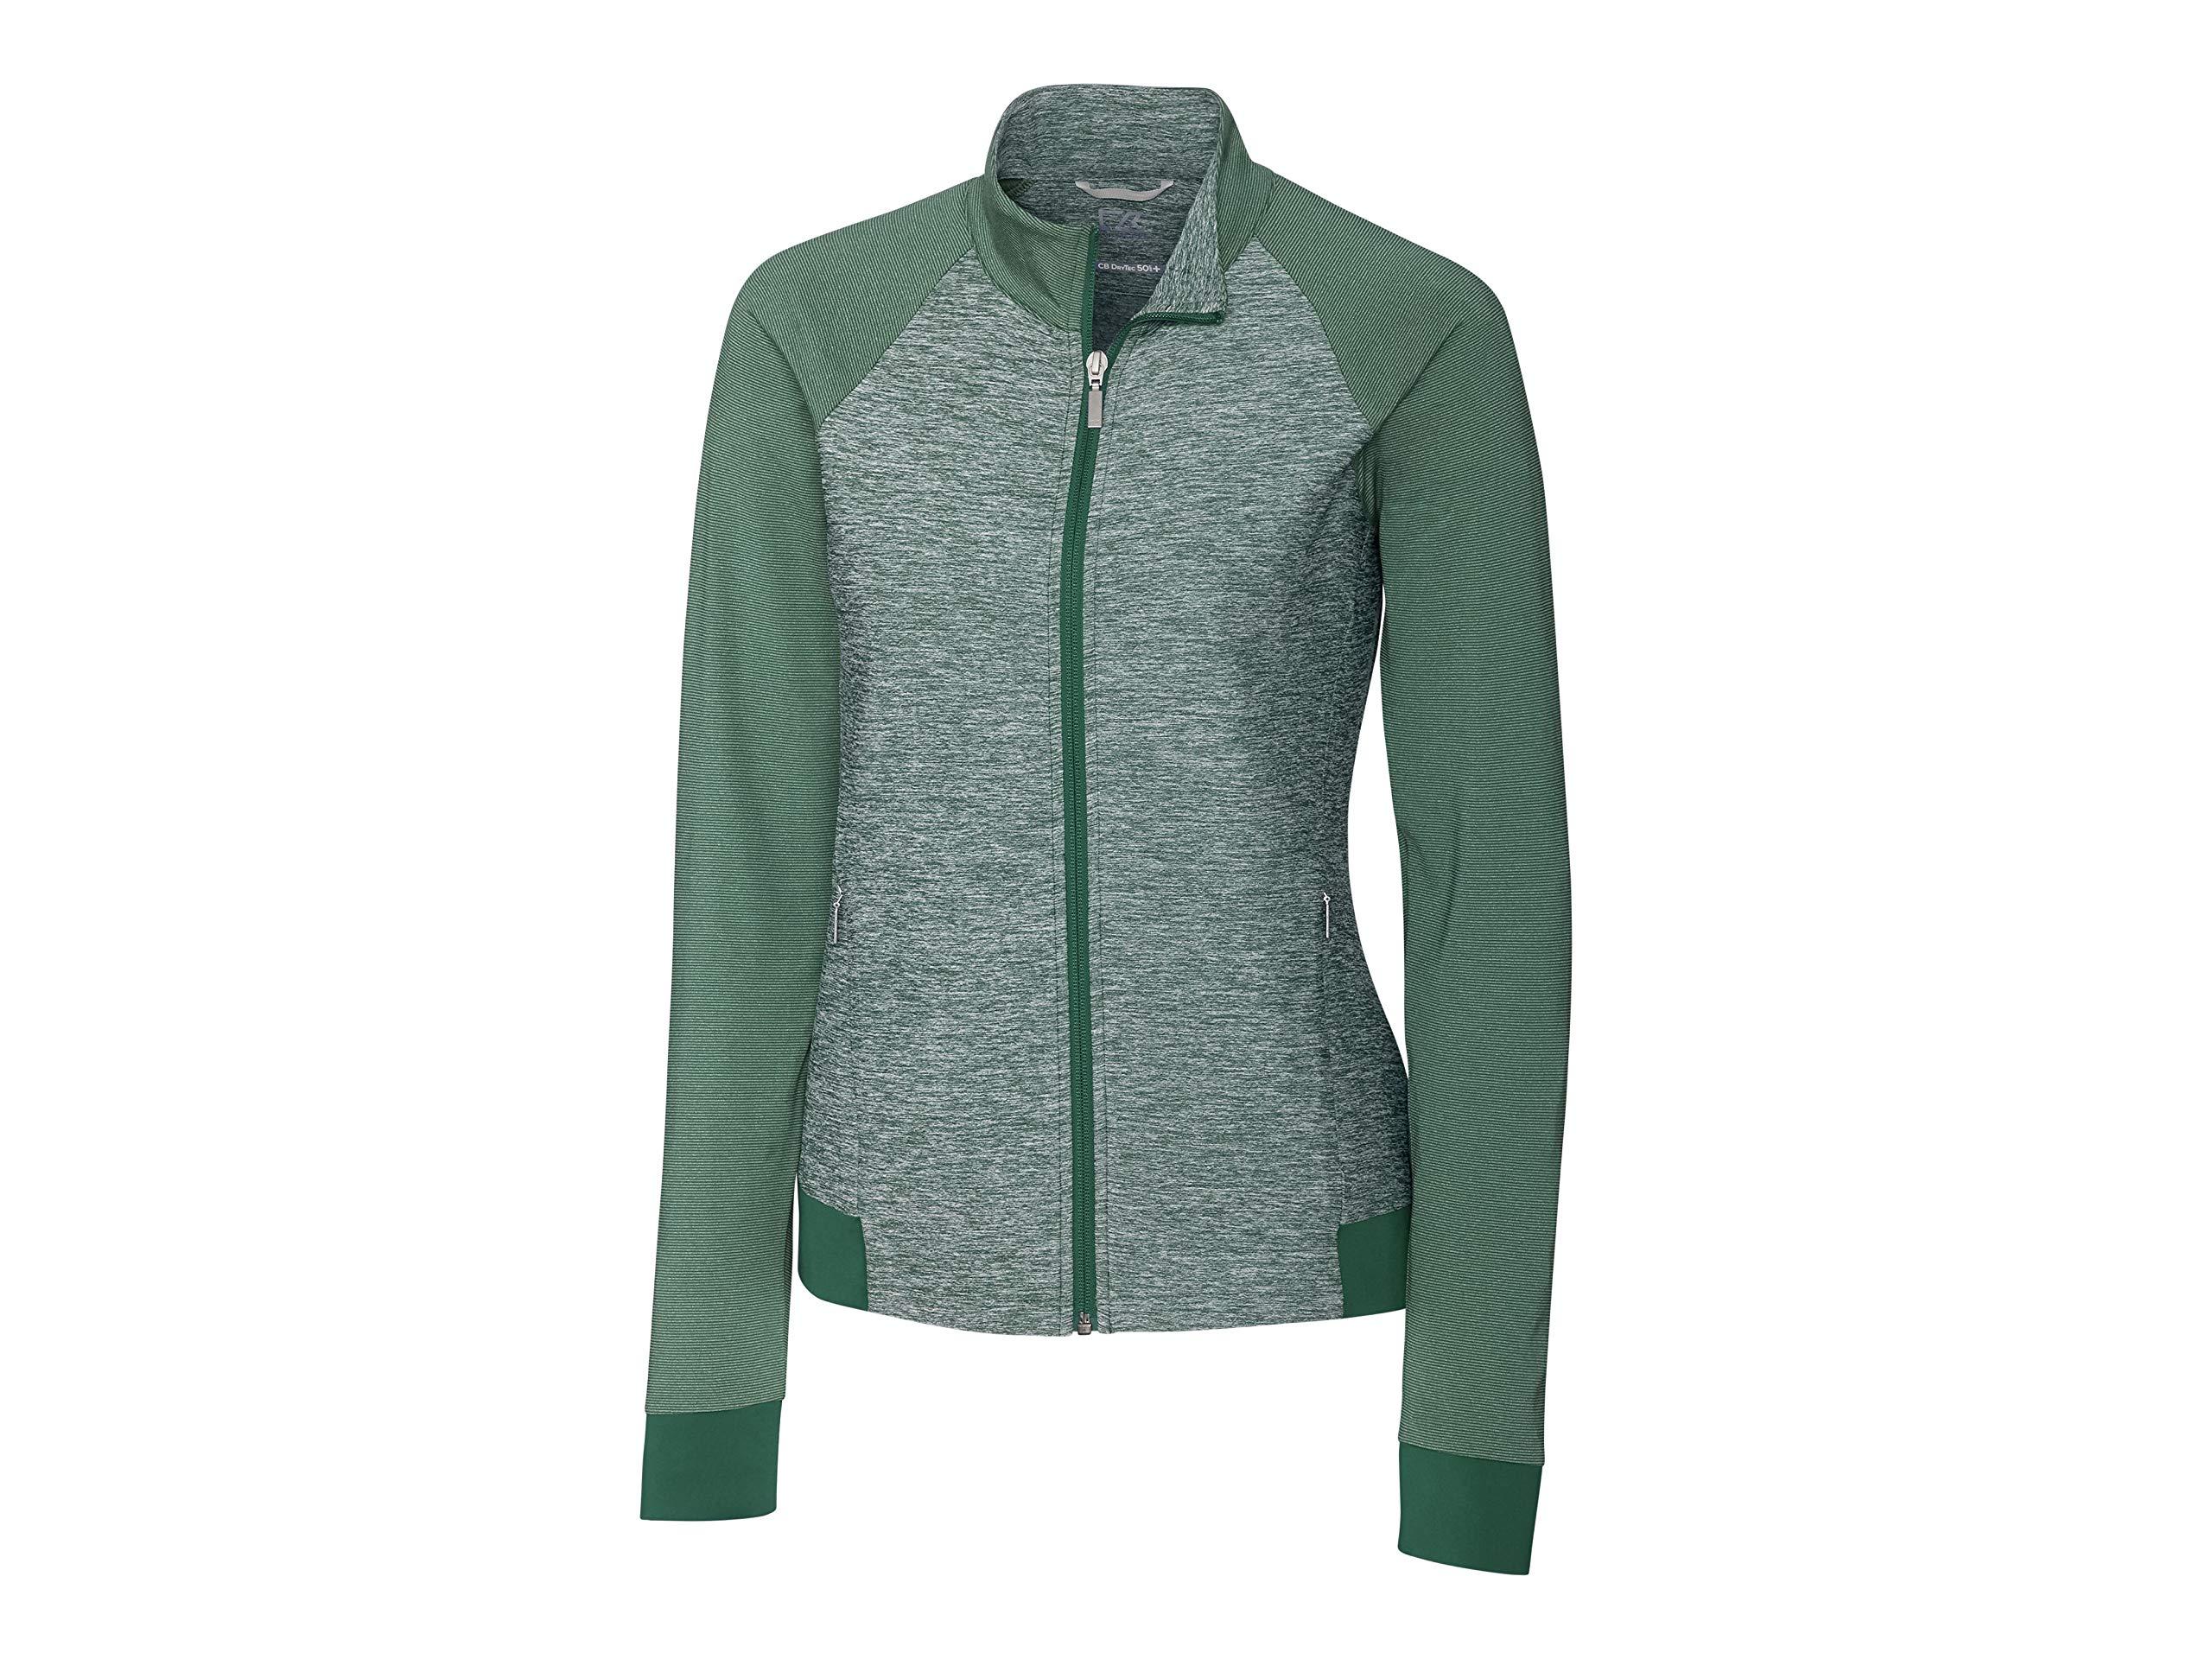 Cutter & Buck LCK08688 Women's L/S Lena Full Zip Jacket, Hunter - XS